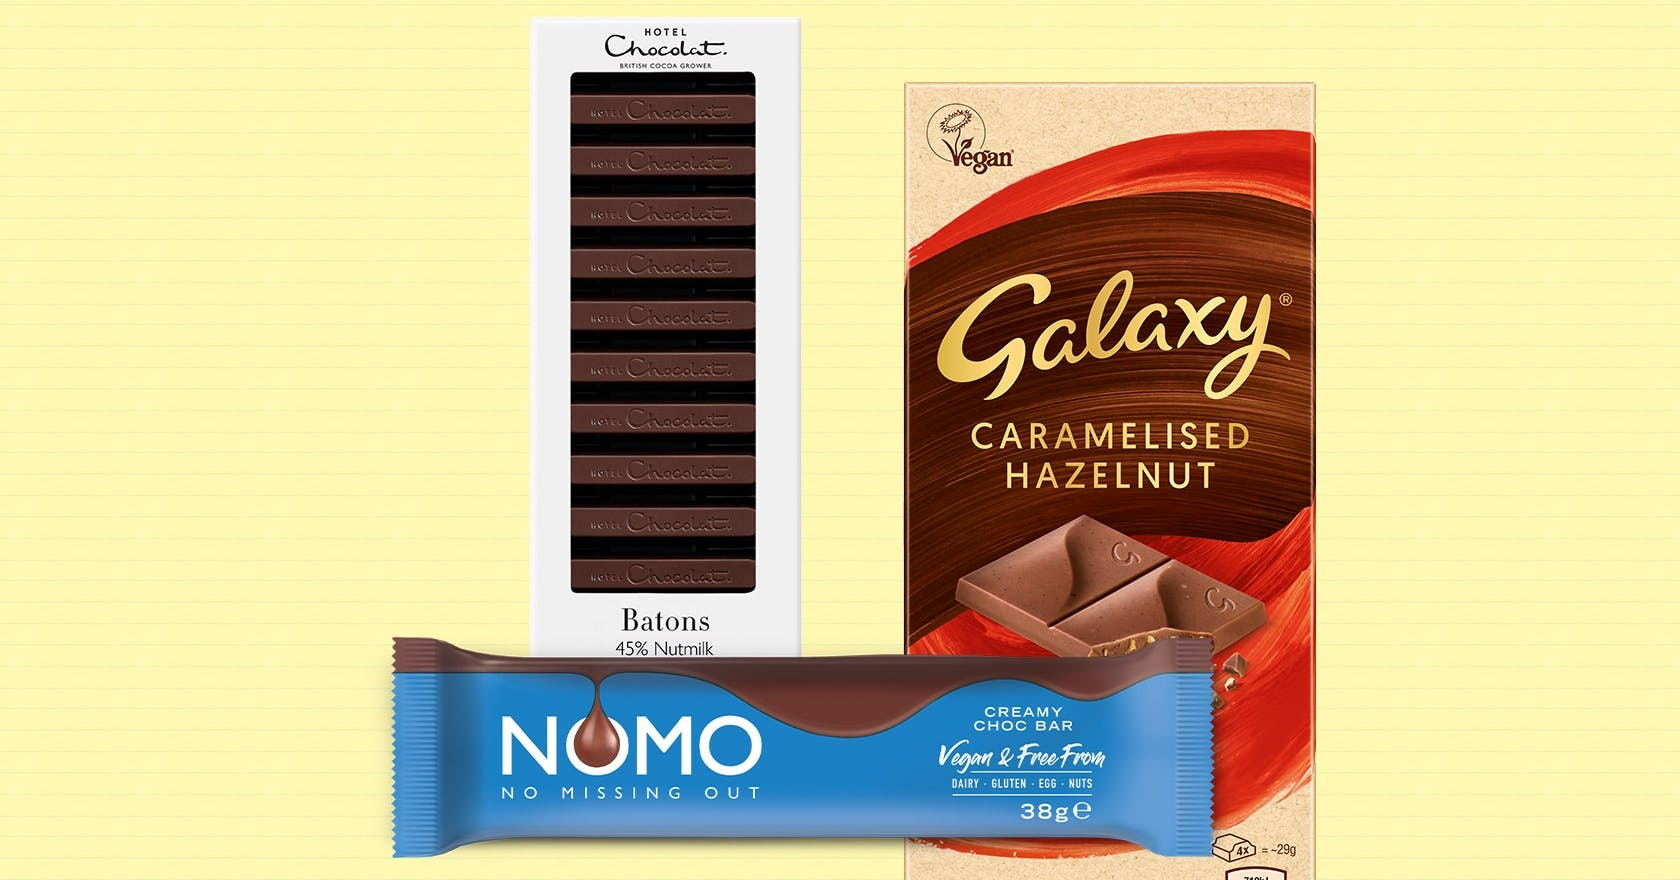 Vegan Chocolate Bars The Best Dark And Milk Choc Alternatives